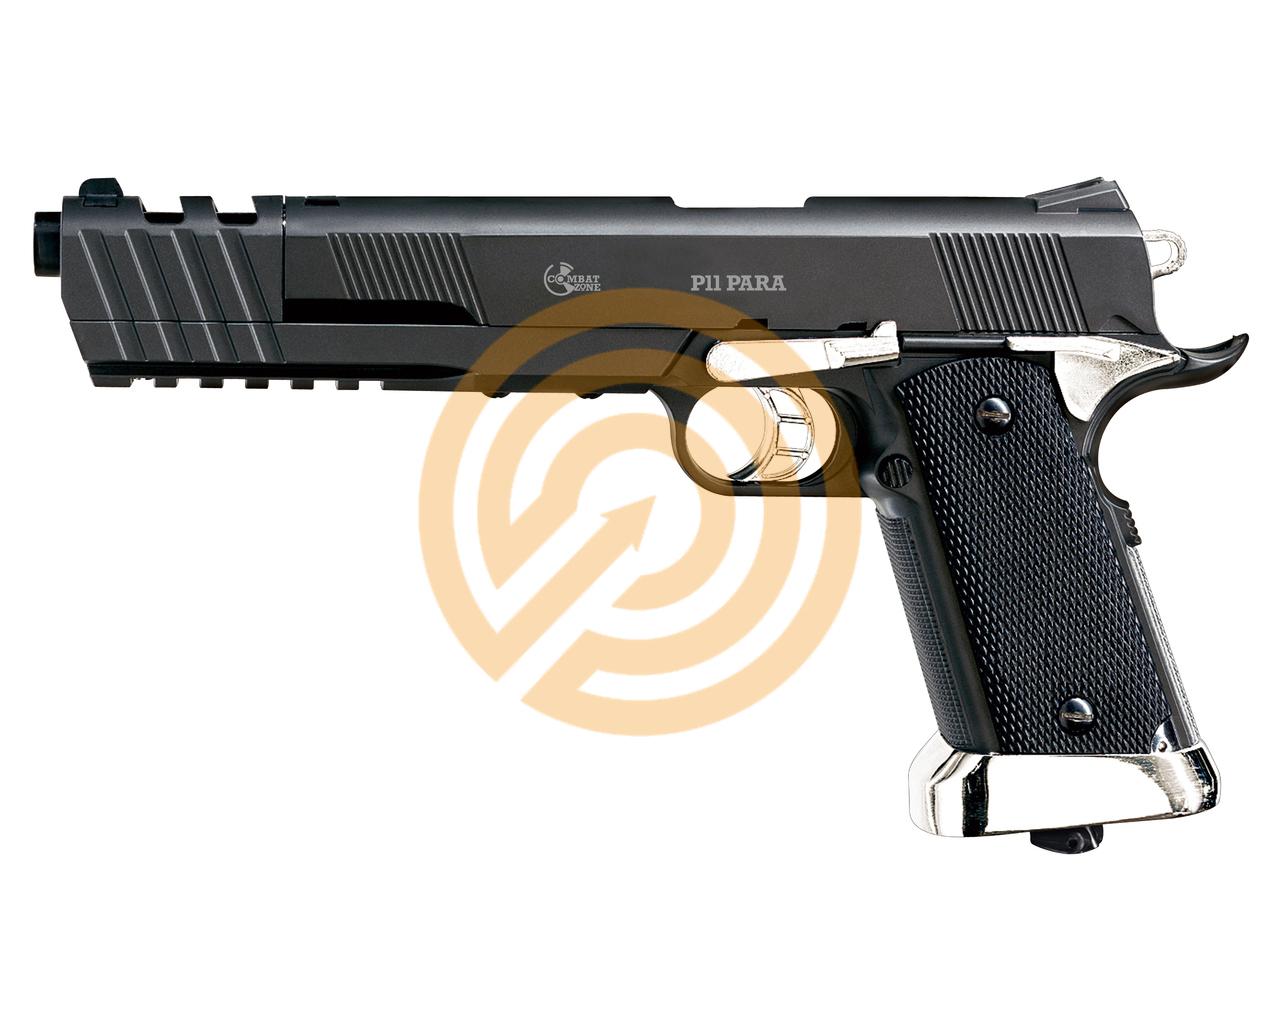 Umarex Combat Zone Pistol P11 Para NBB 112304 1000 JVD Outdoor 1280x1024